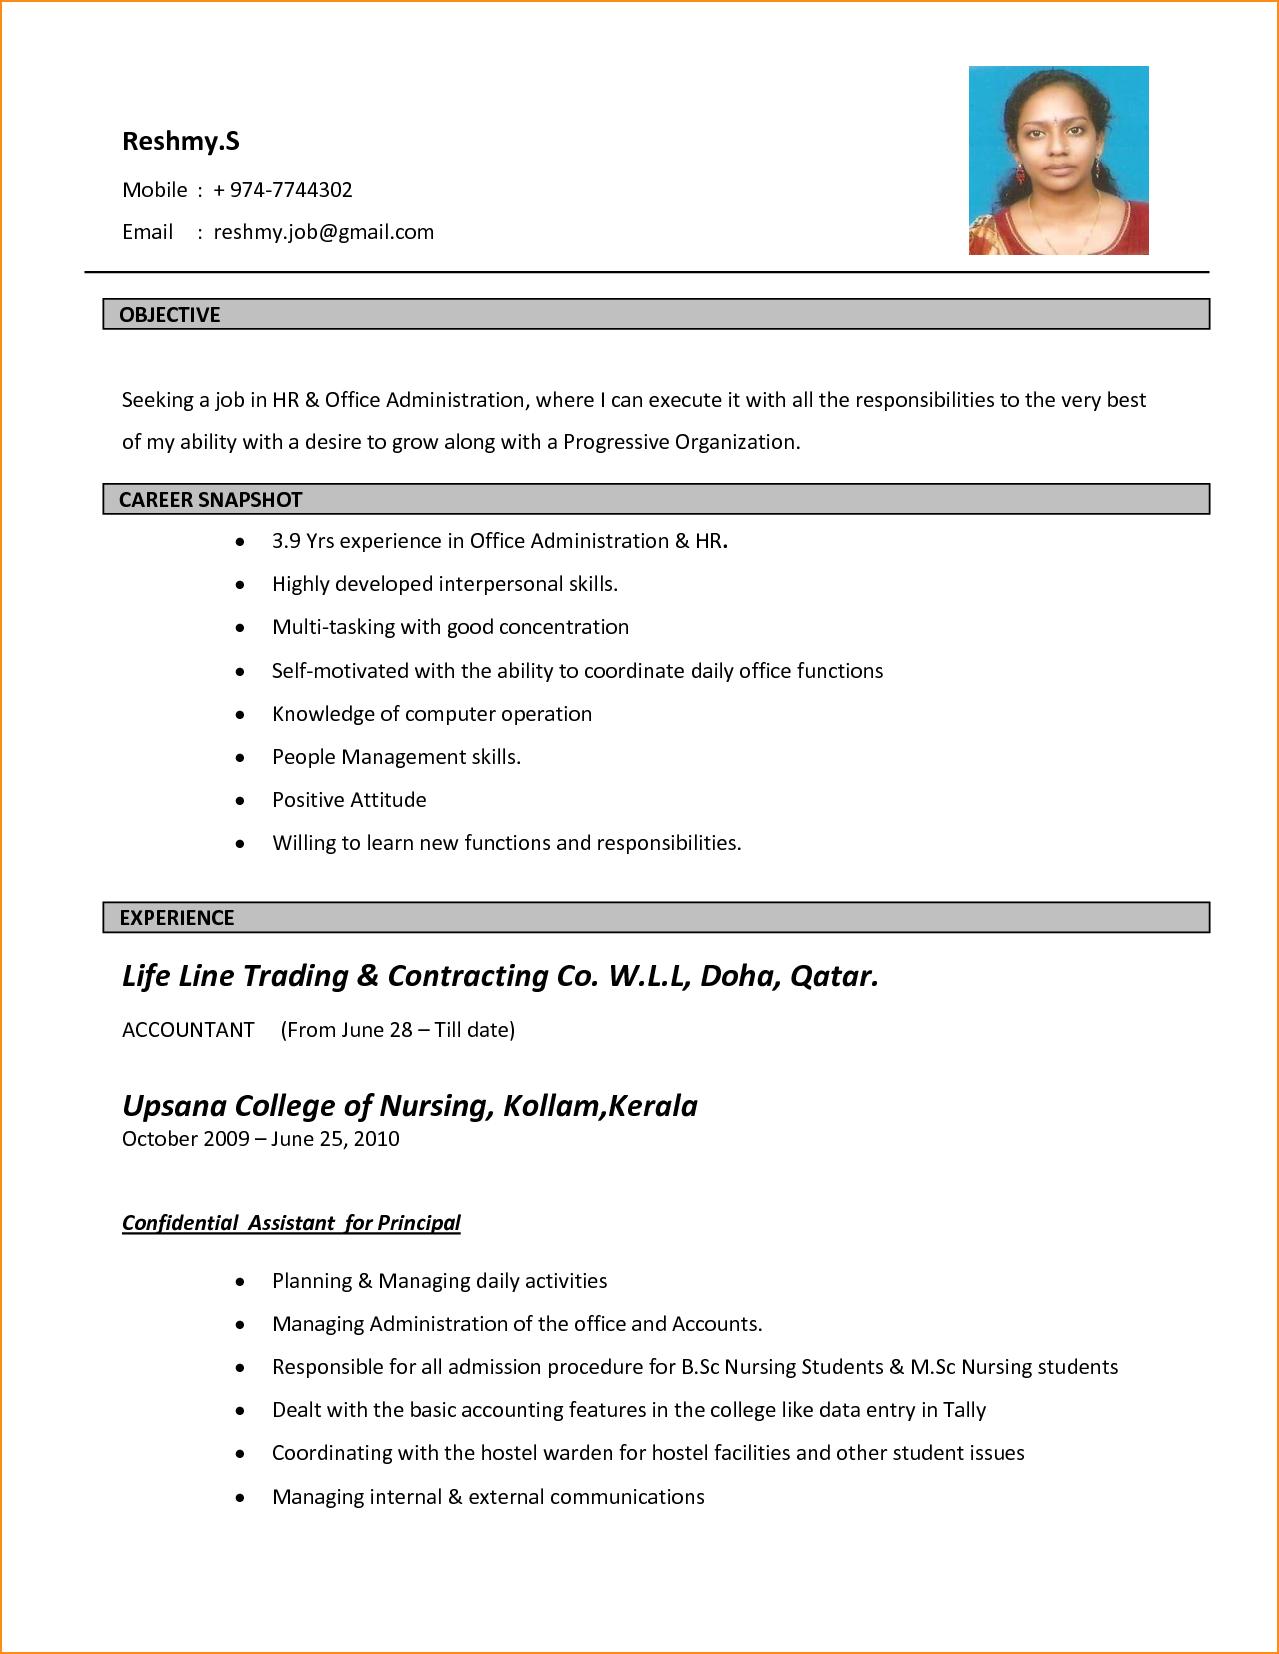 Resume Format Kerala Bio Data For Marriage Job Letter